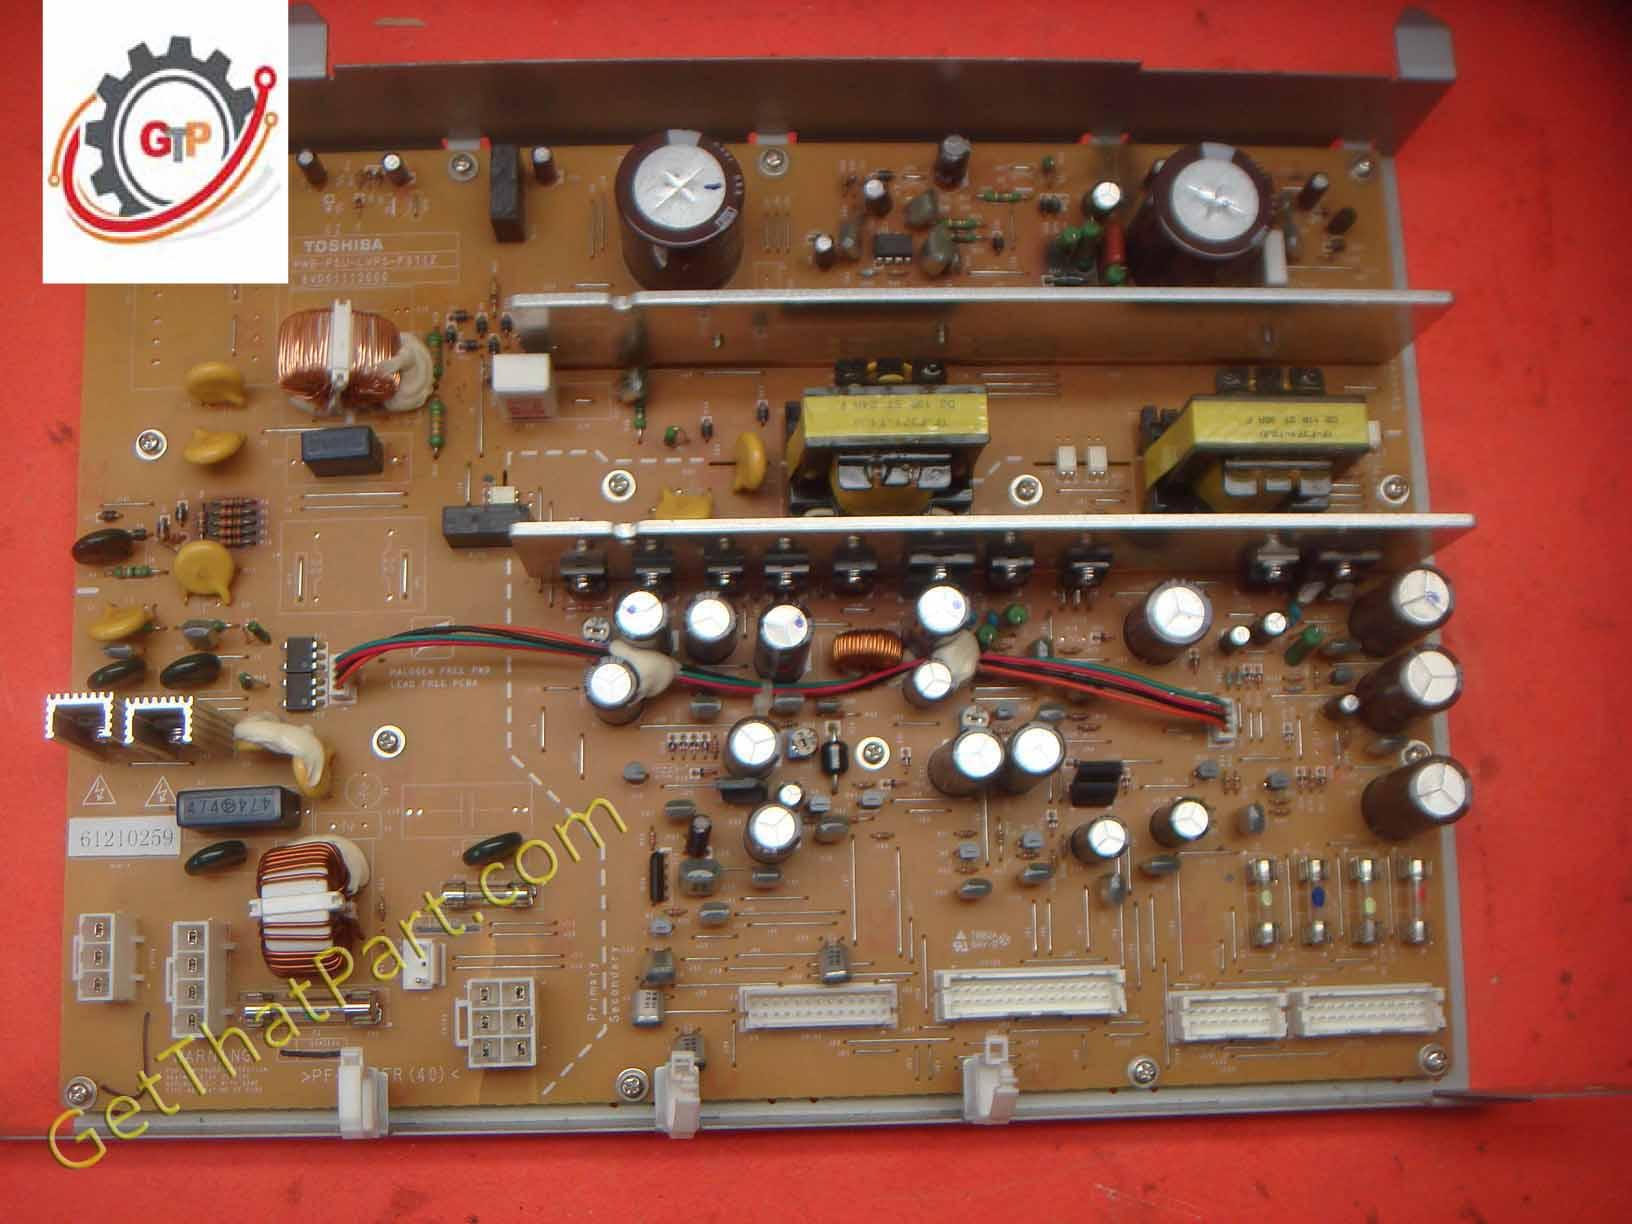 Toshiba Estudio 282 230 232 233 200l 202l 203l Lvps Main Power Supply Connector Wiring Diagram